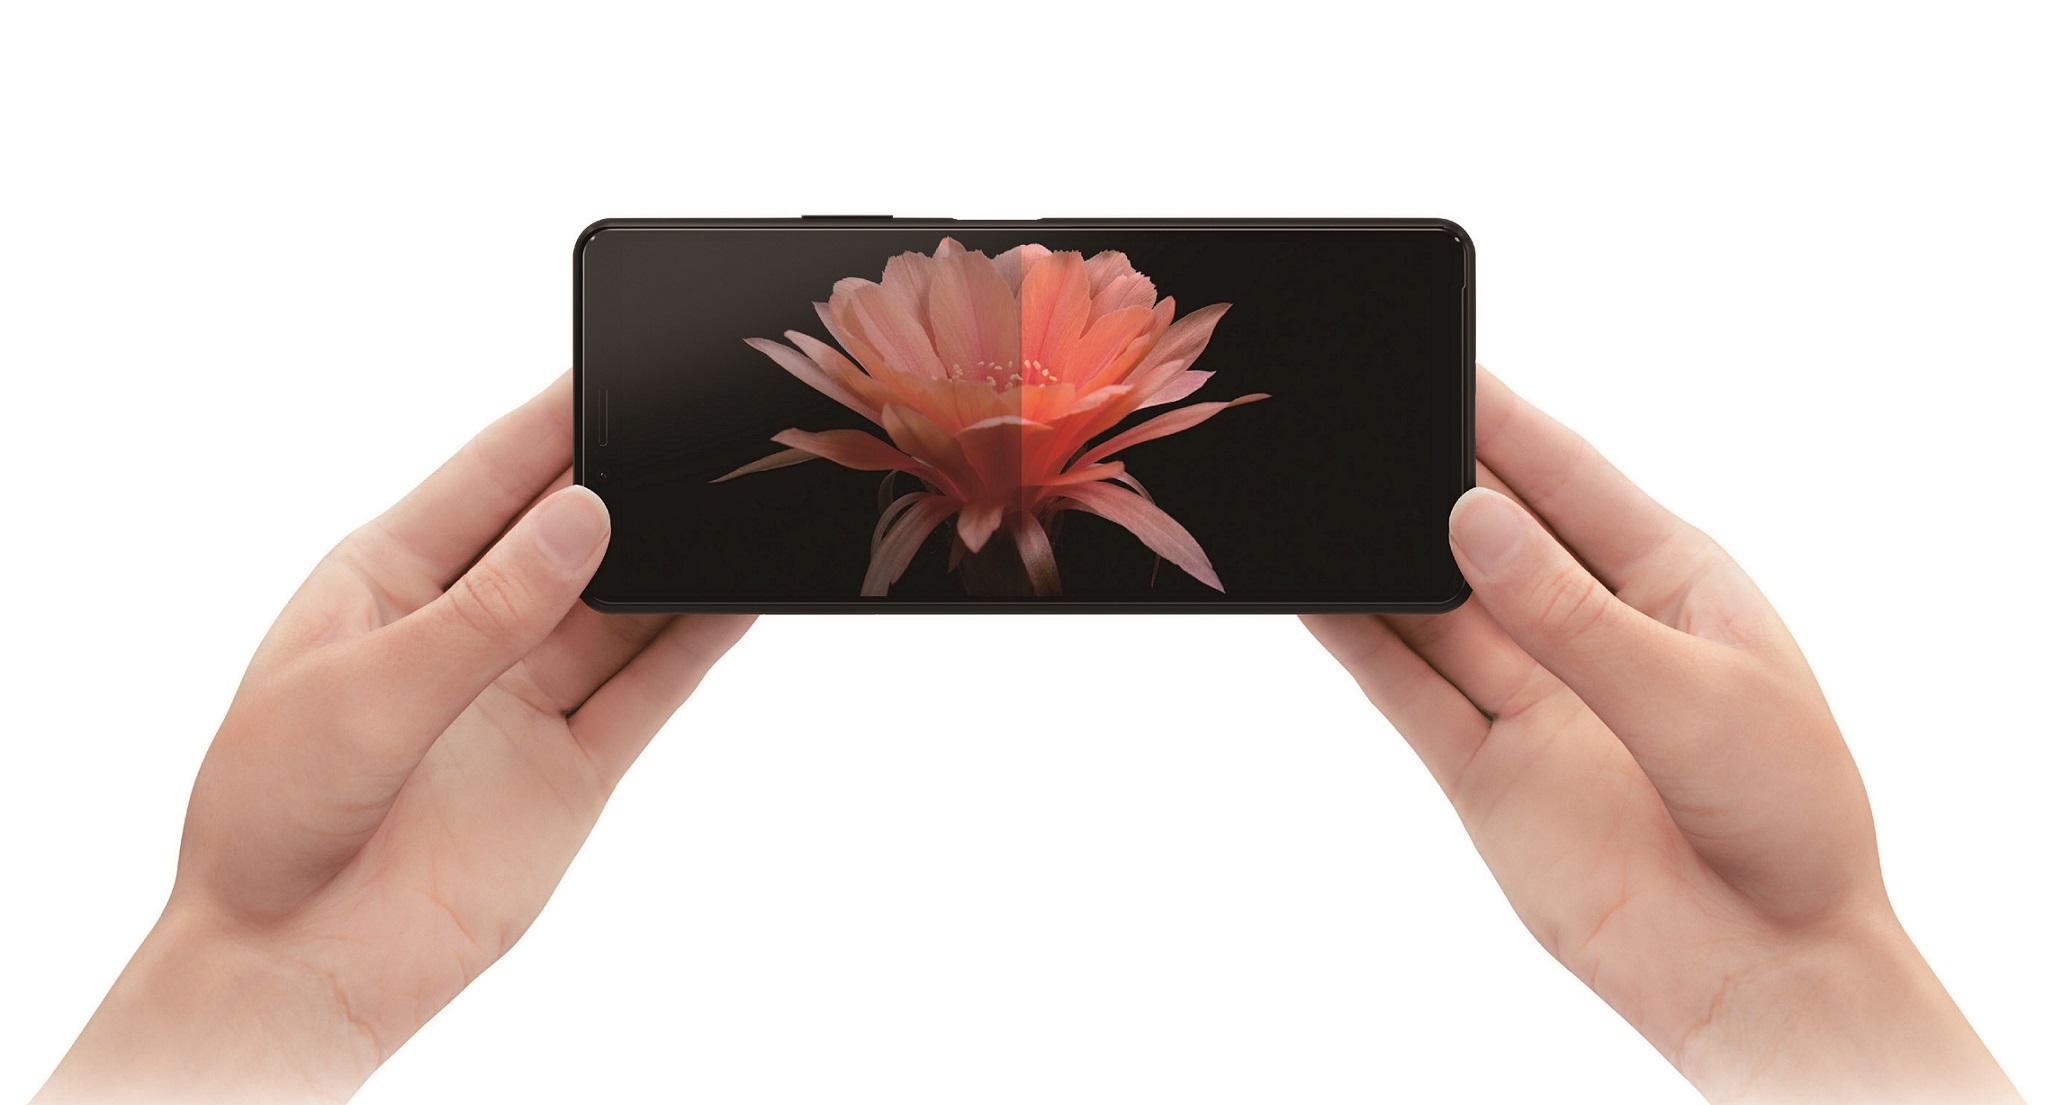 Xperia 10 II擁有6吋21比9 OLED寬螢幕,延續俐落優雅的無邊框設計,打造出時尚美型質感。(2)